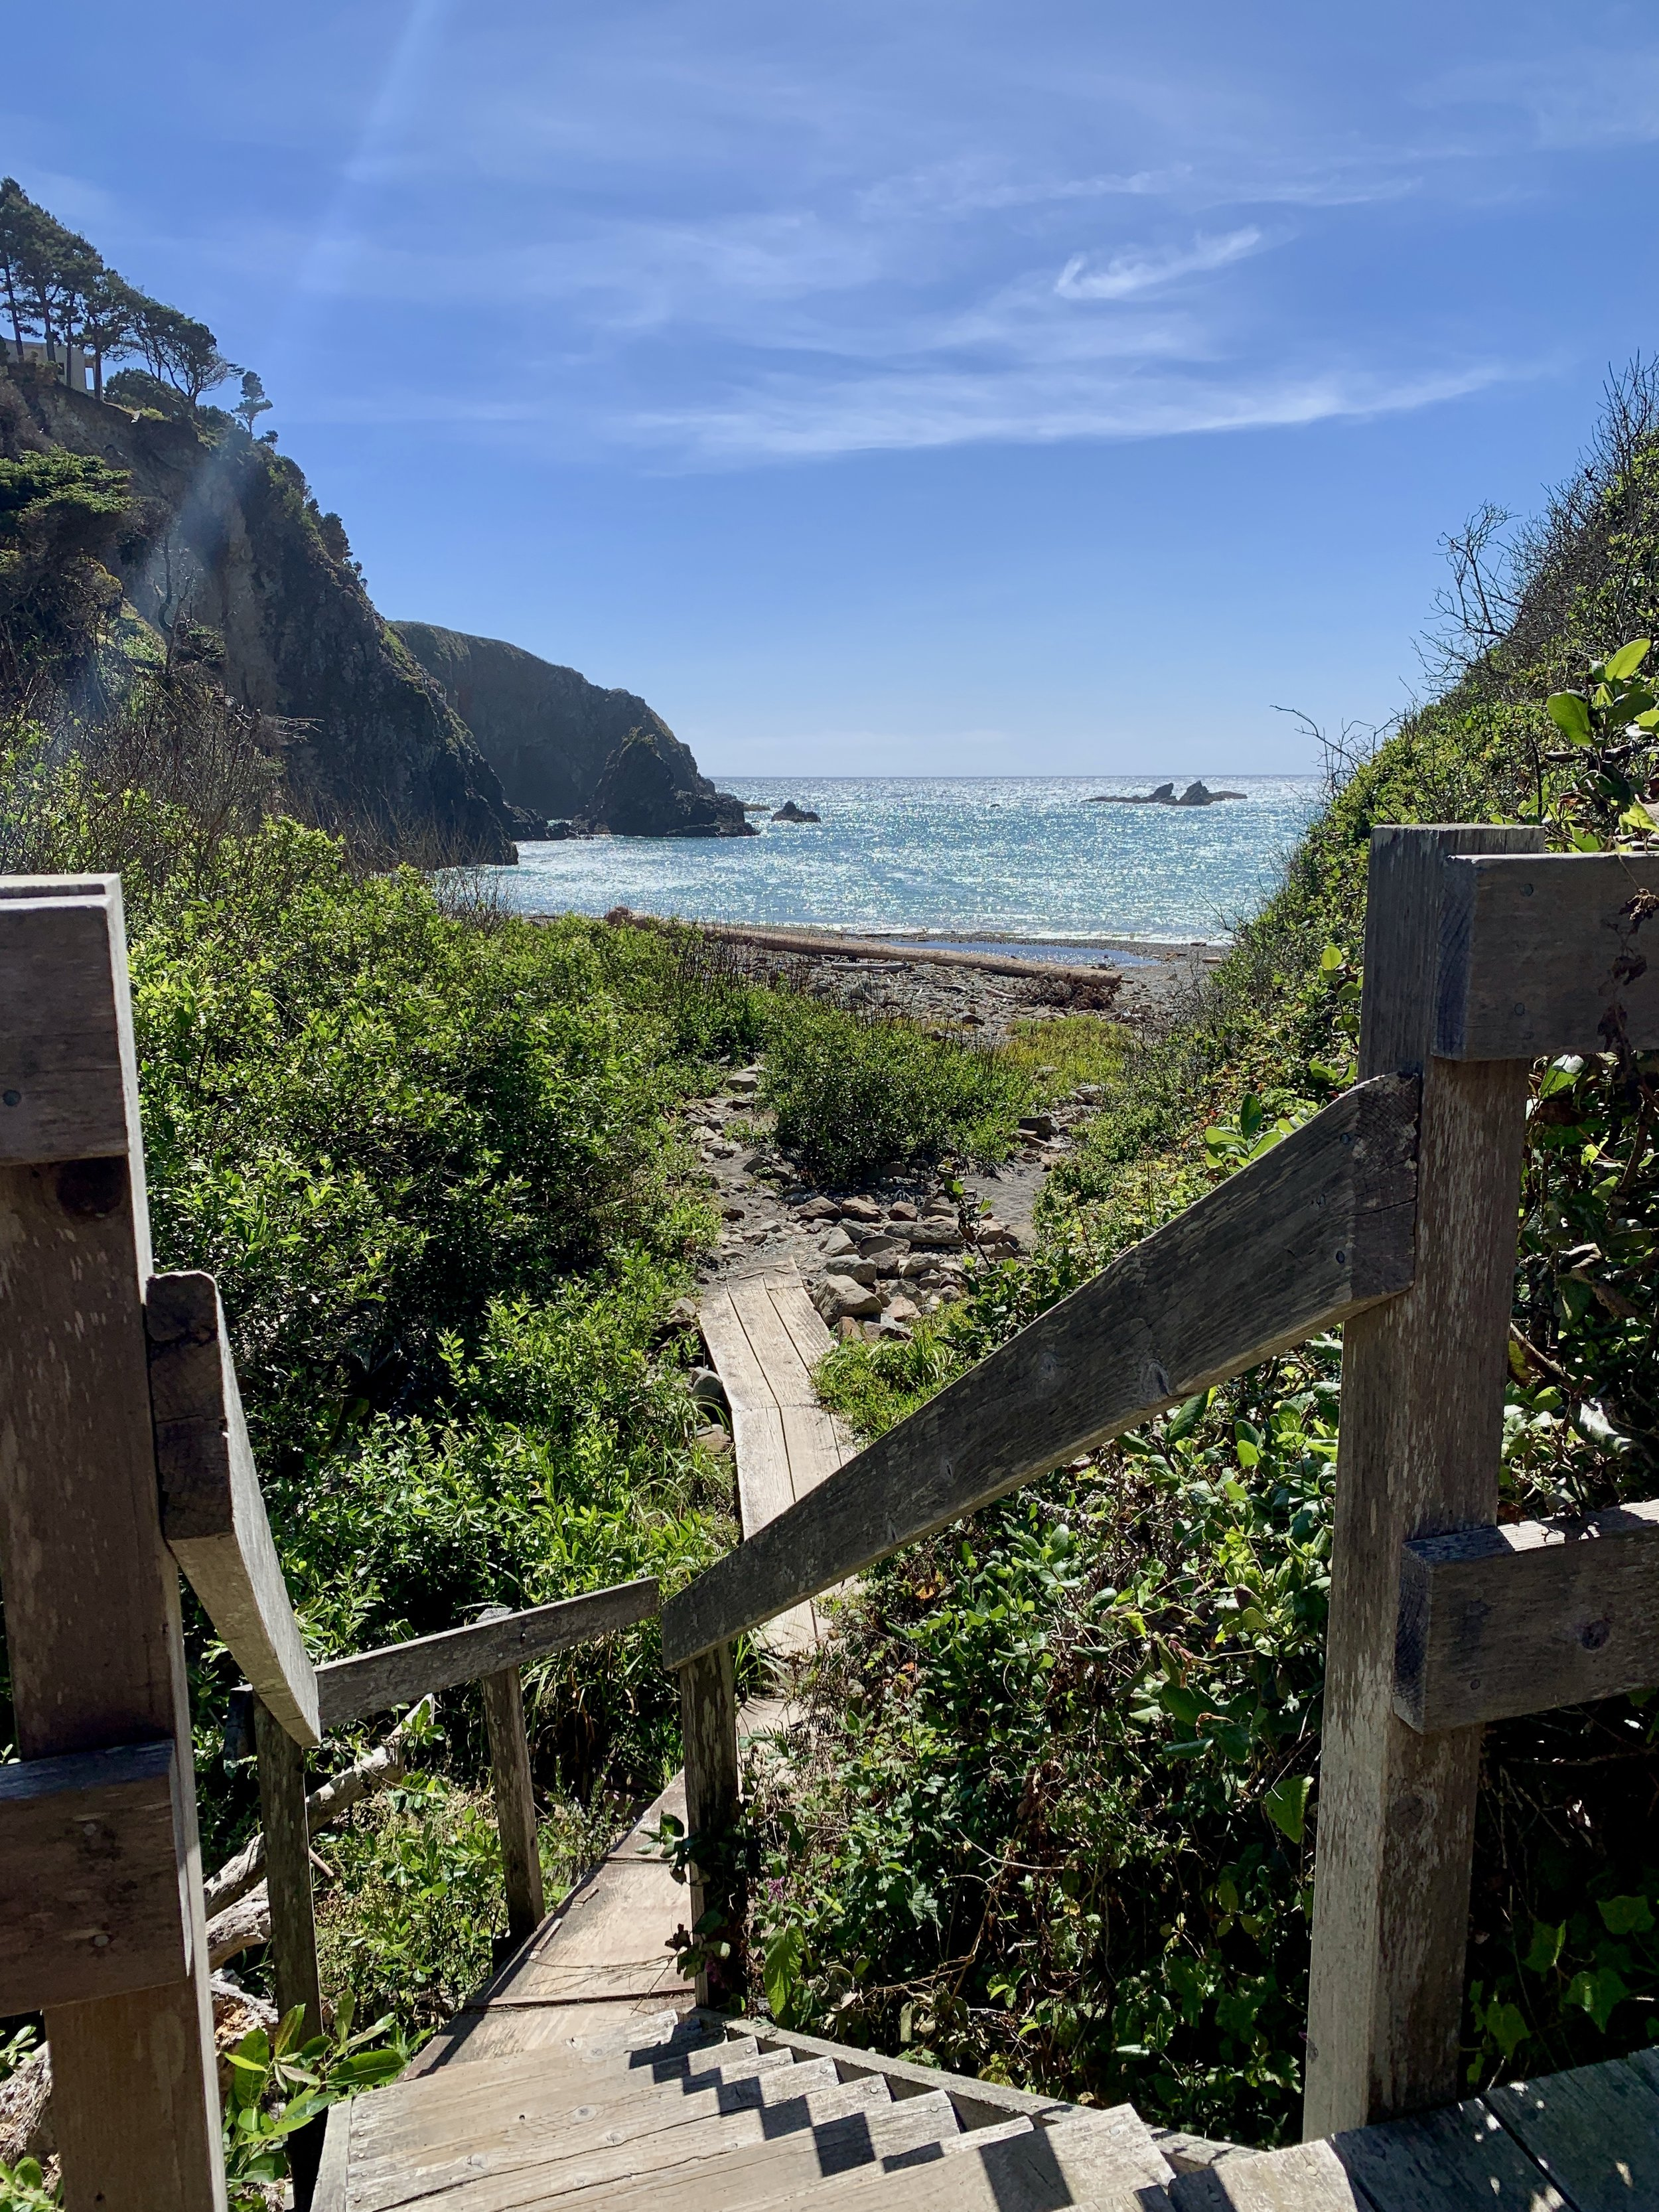 The stairs down to Dark Gulch beach.